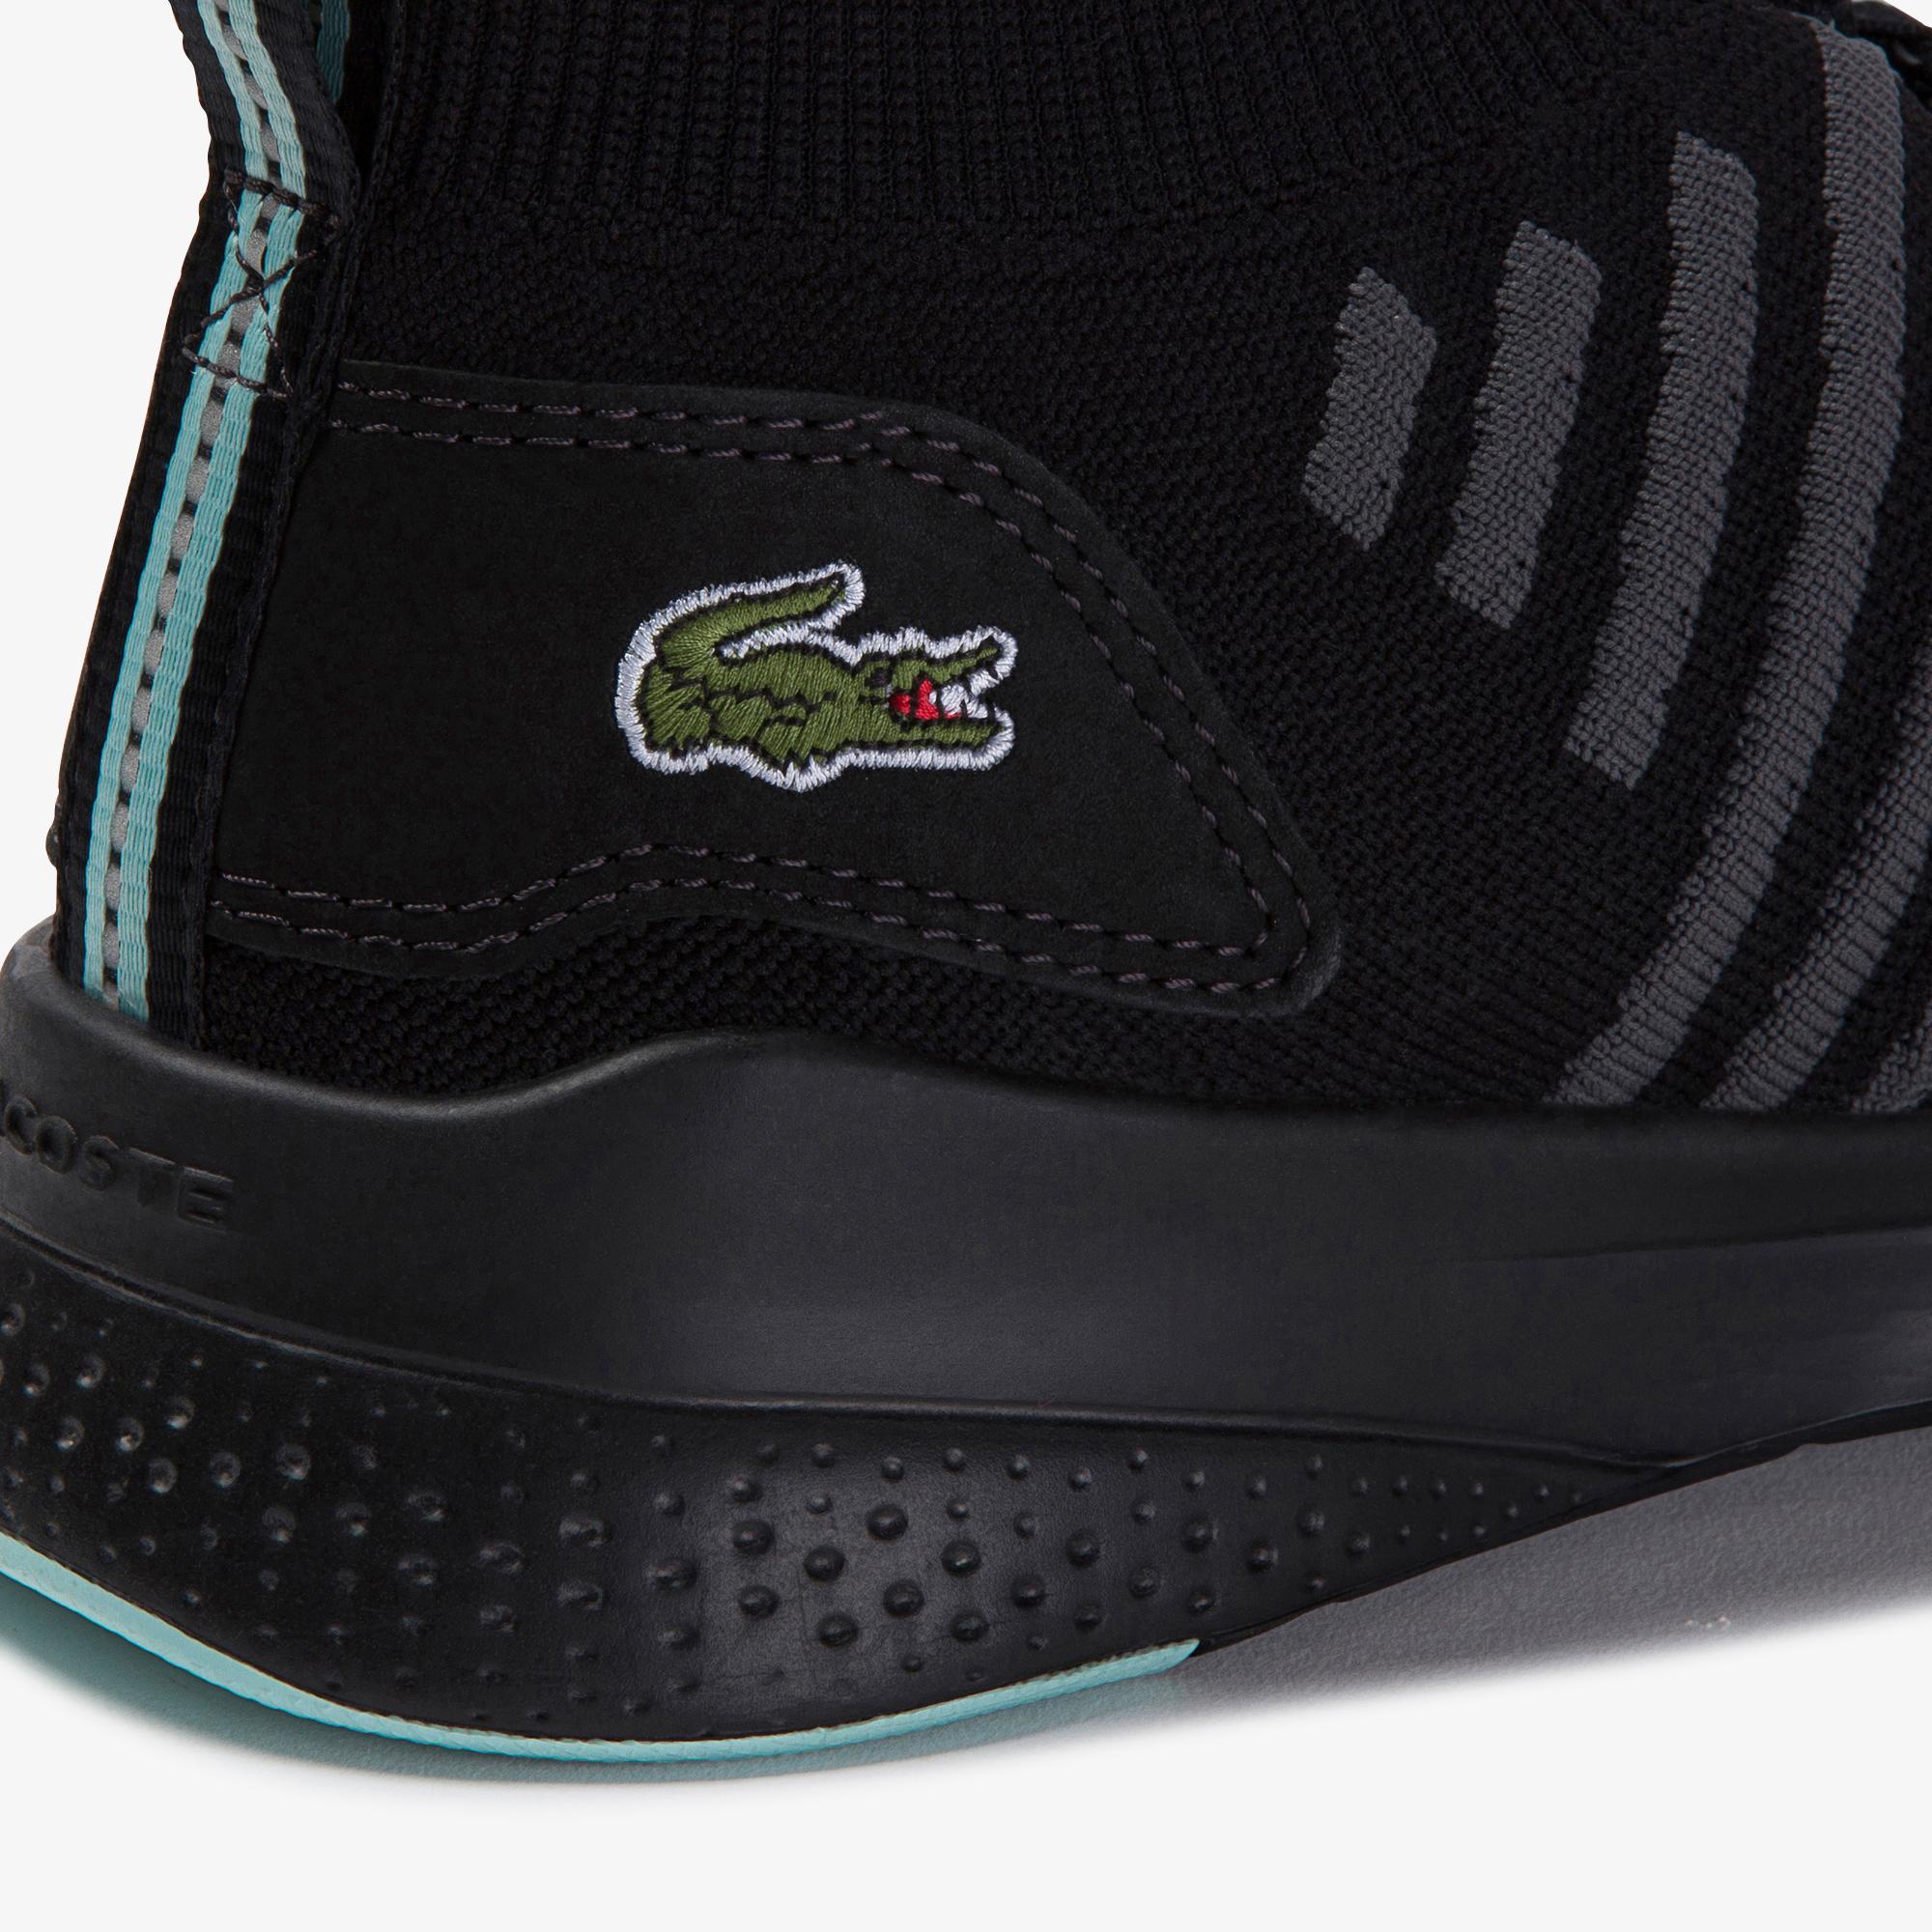 Lacoste Lt Fit-Flex 120 1 Sma Erkek Siyah - Açık Yeşil Sneaker